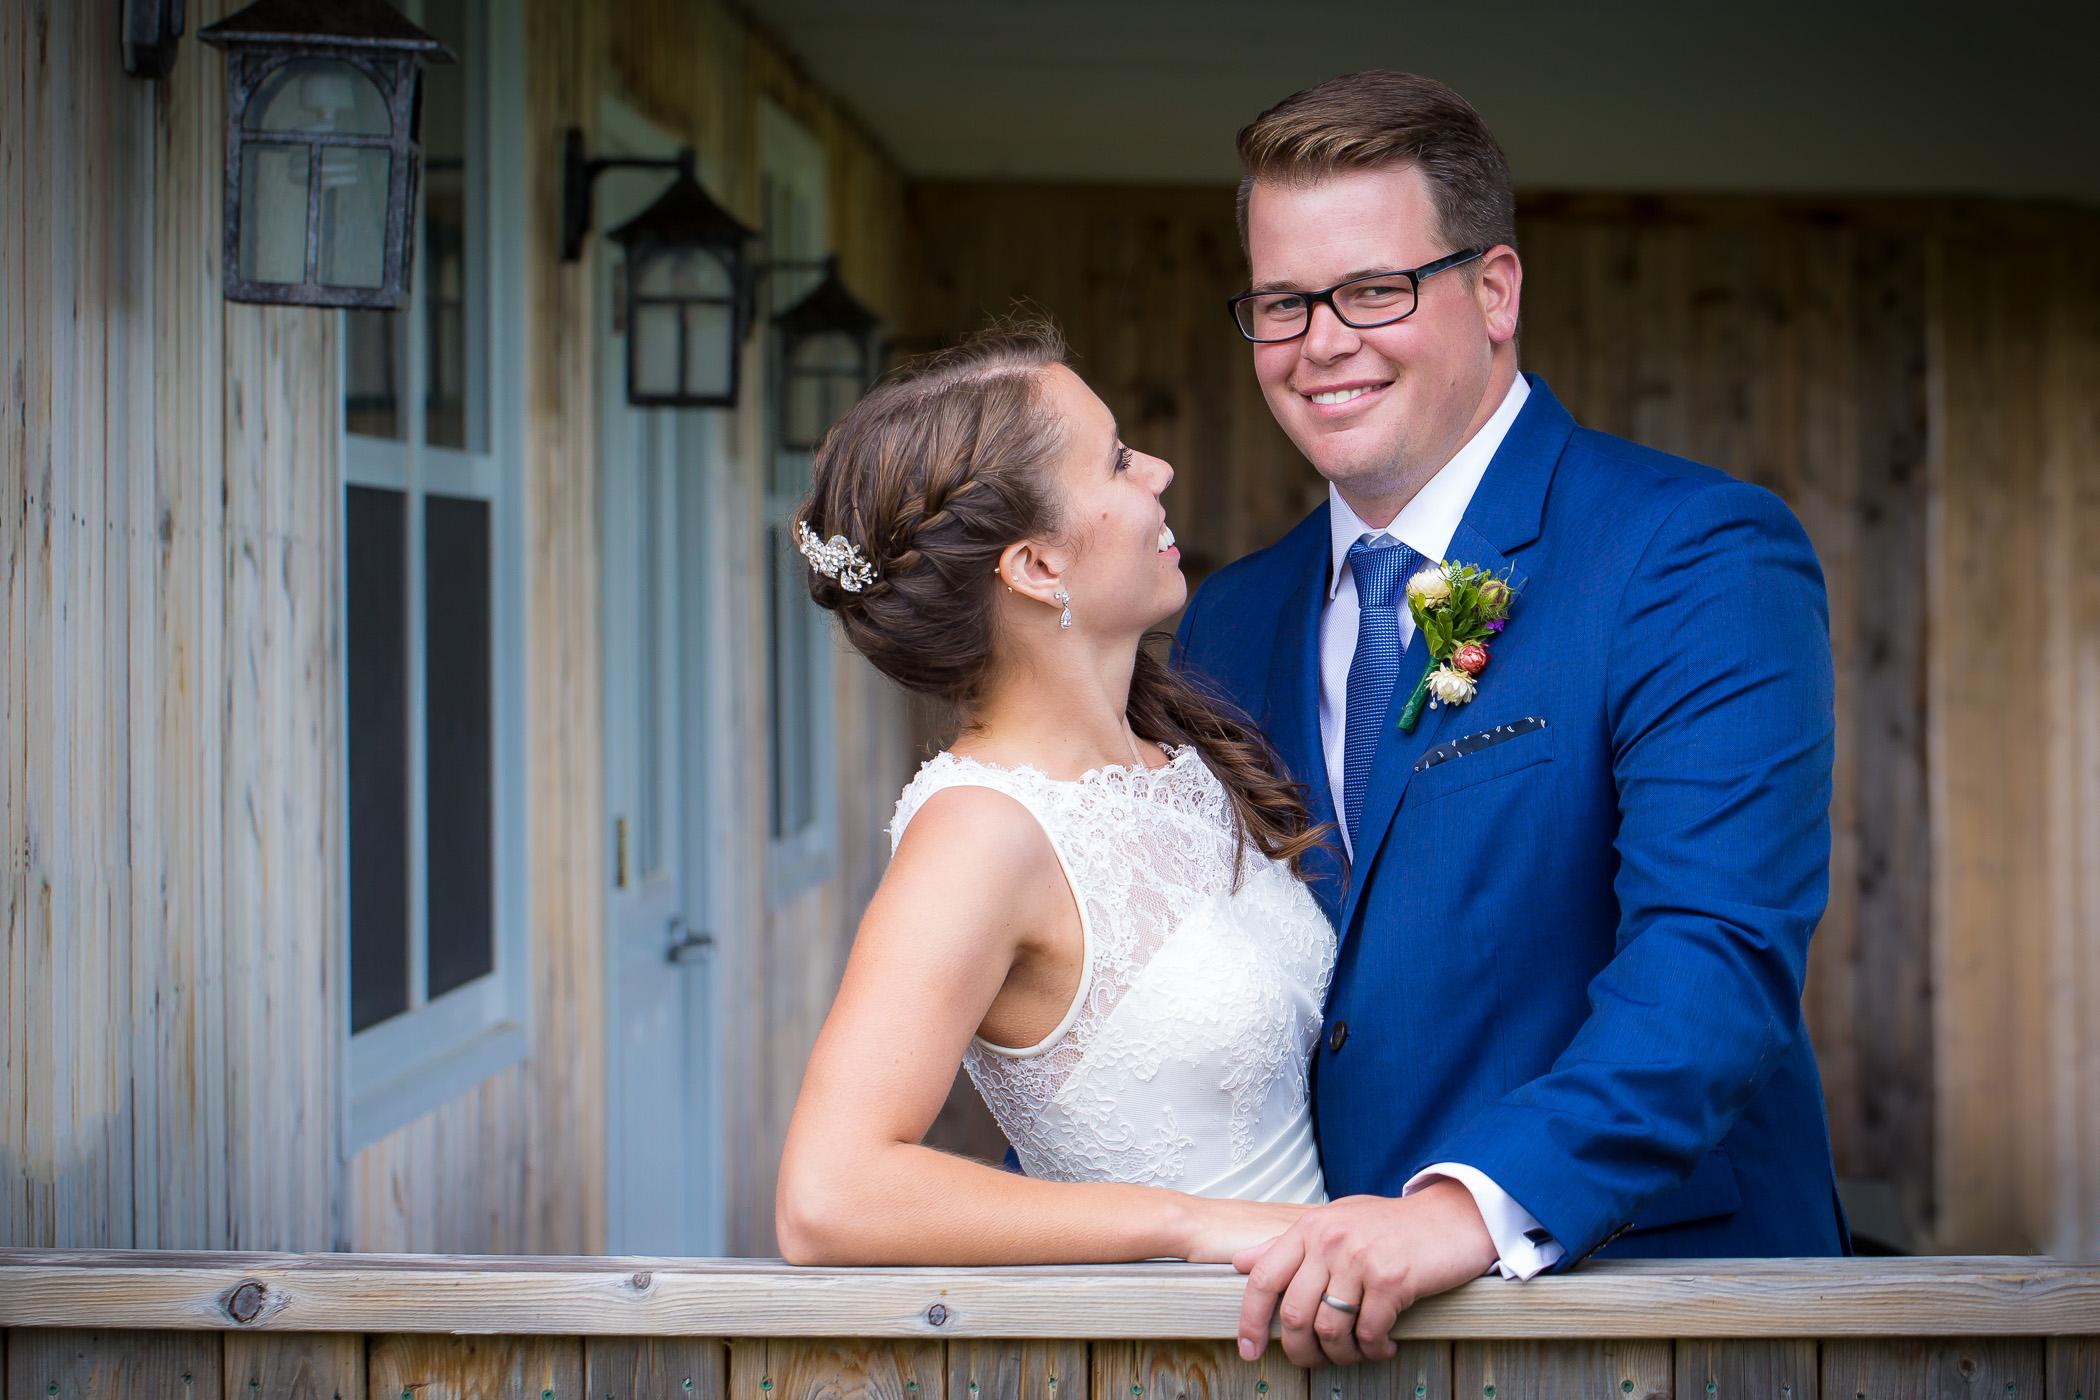 pei photographer sandpiper studios photo of happy bride and groom